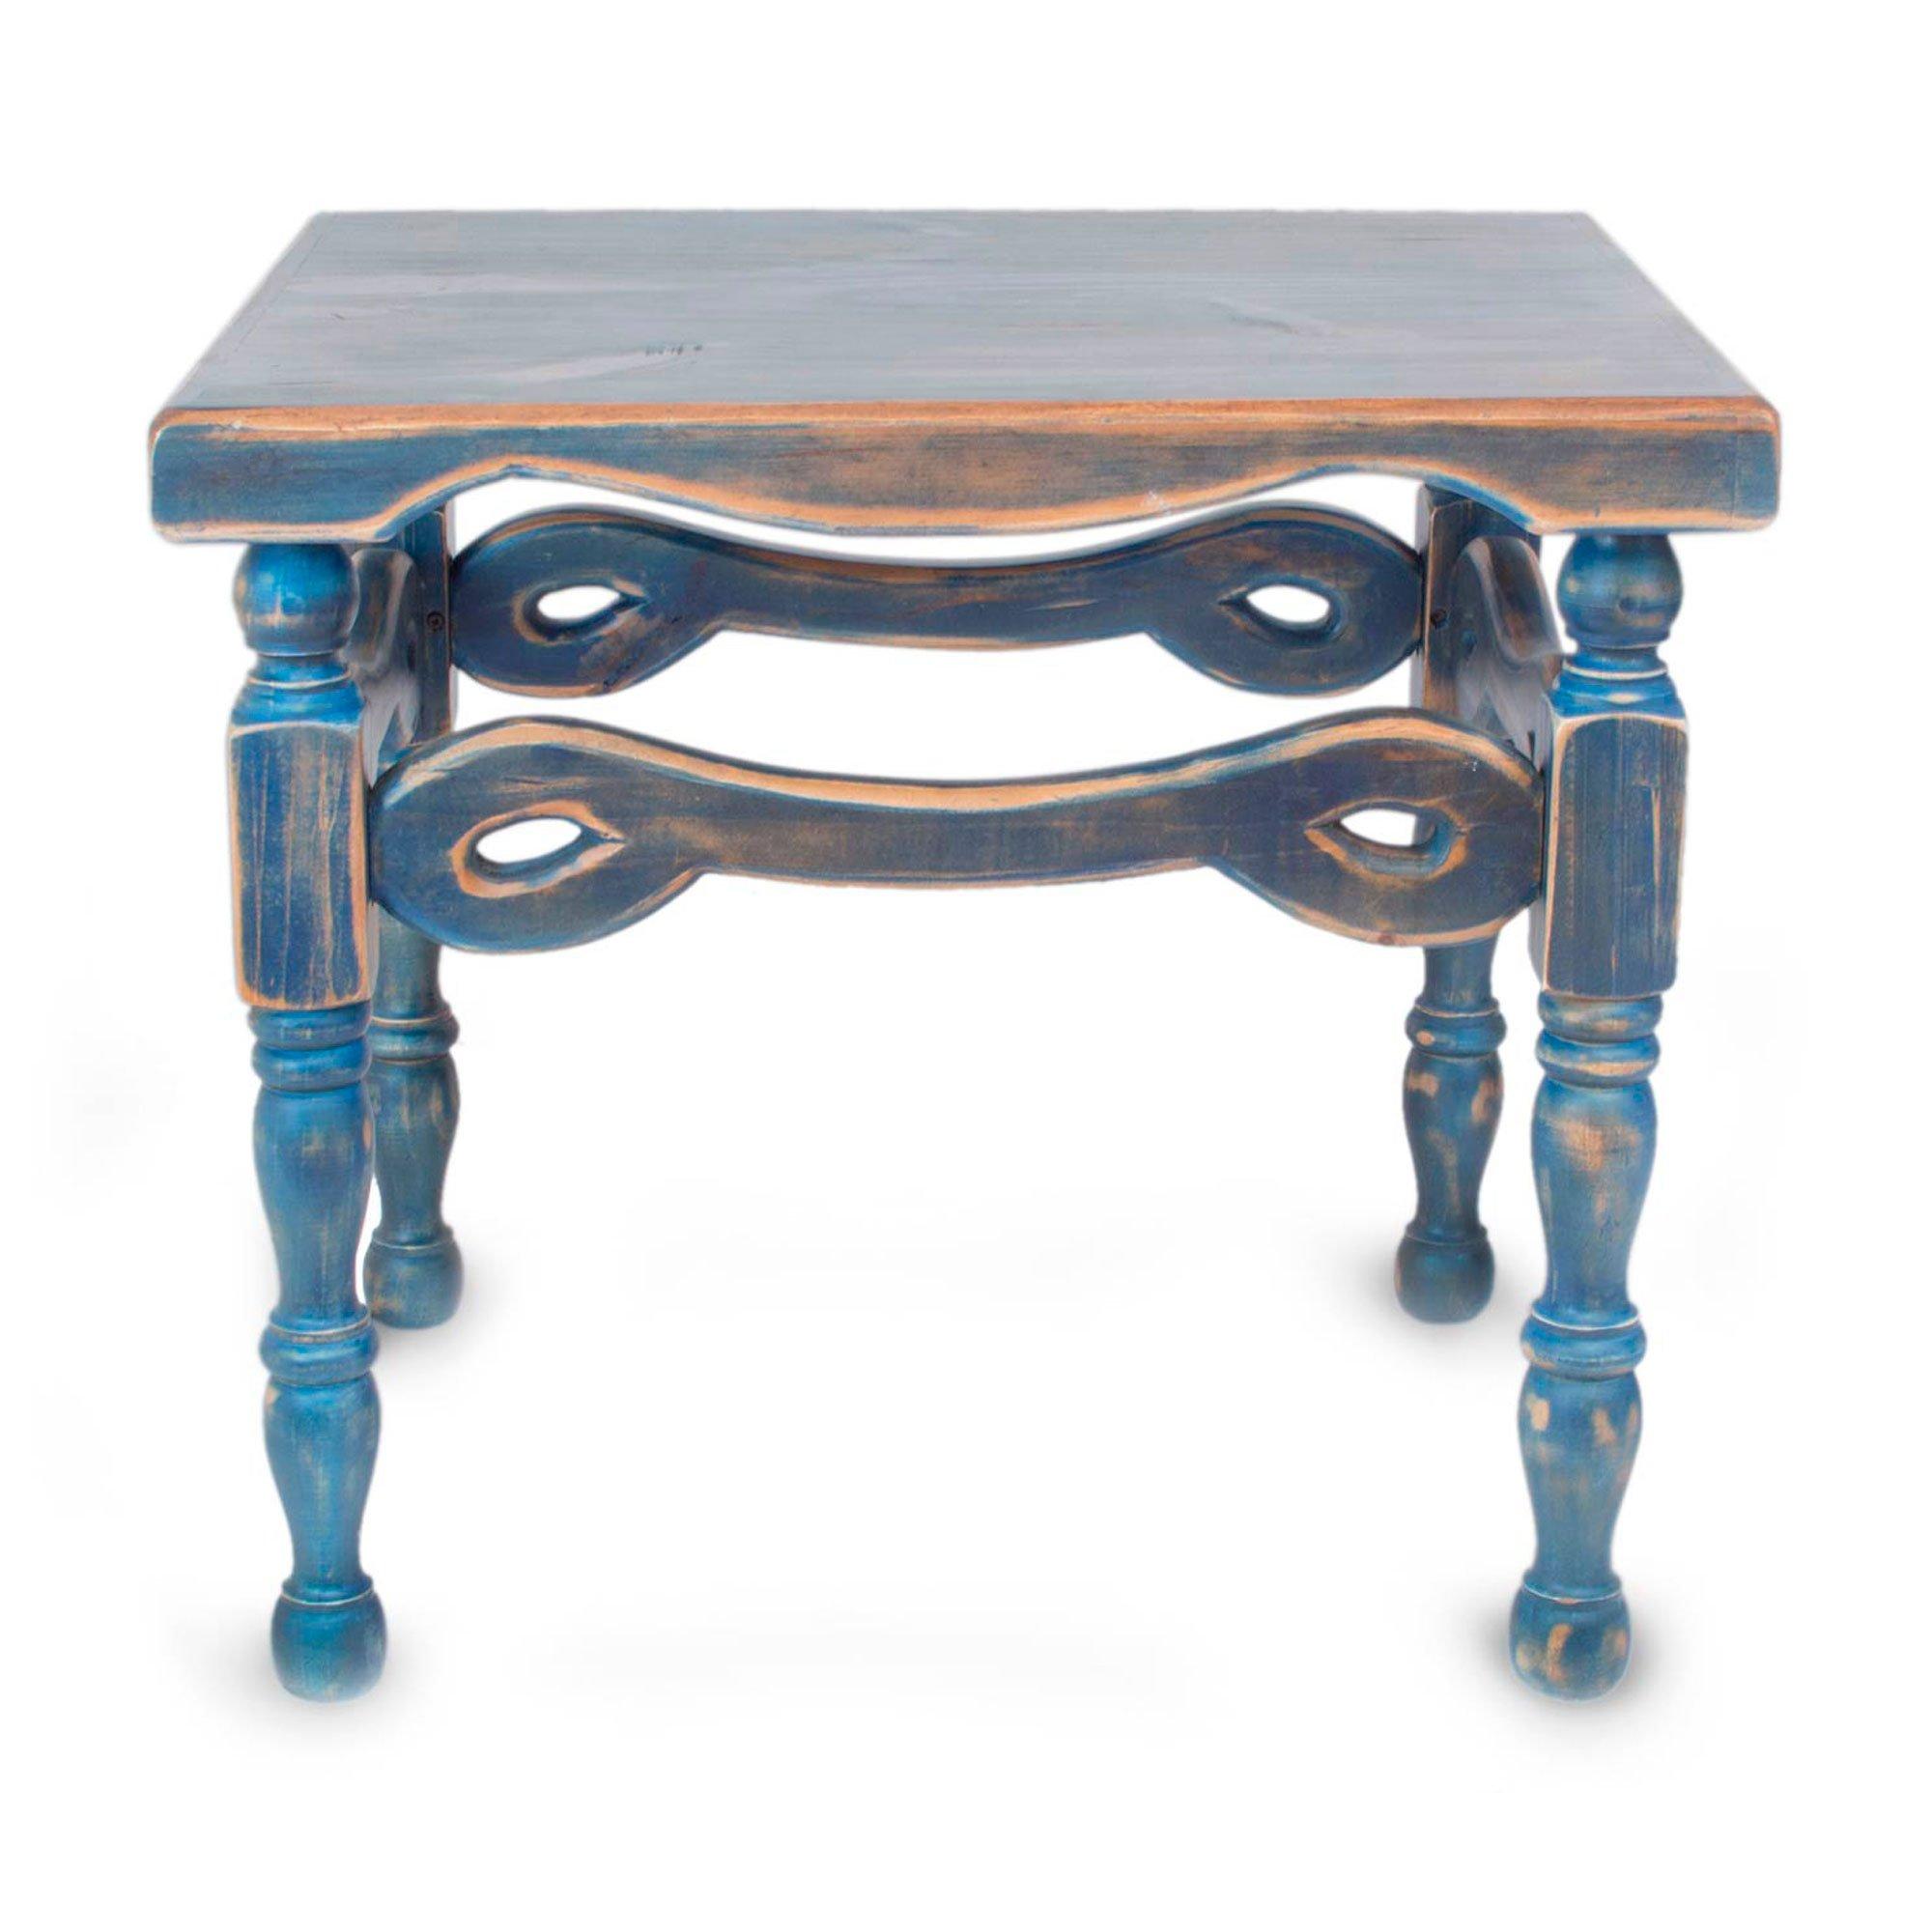 NOVICA Pinewood Rustic End Tables, 23.5'' Tall, Blue, 'Hidalgo Royal Blue' by NOVICA (Image #2)